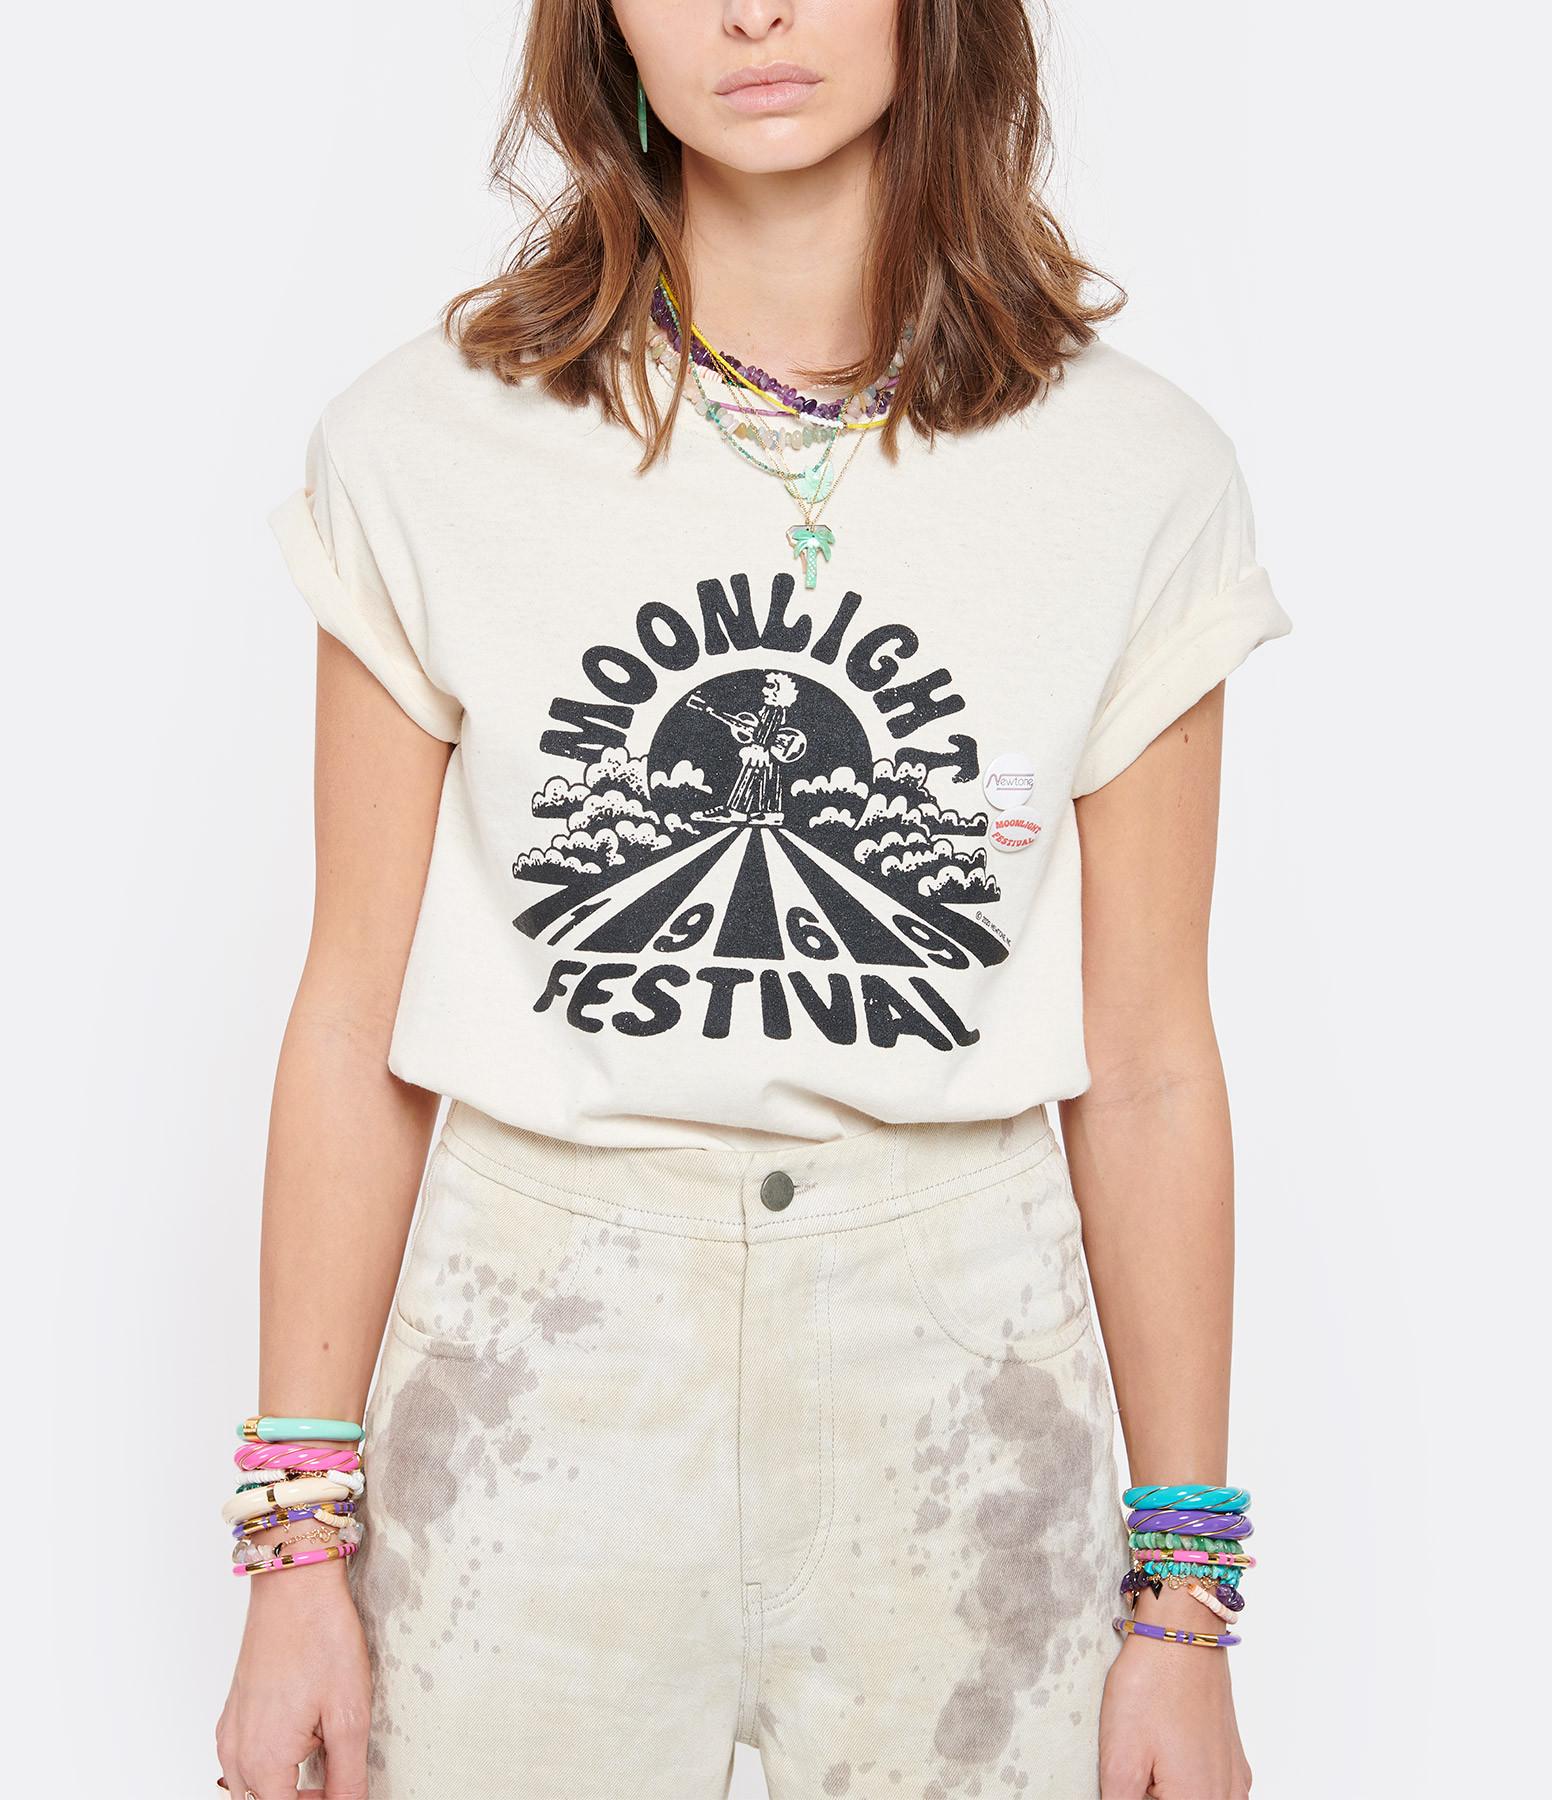 NEWTONE - Tee-shirt Trucker Moonlight Coton Naturel